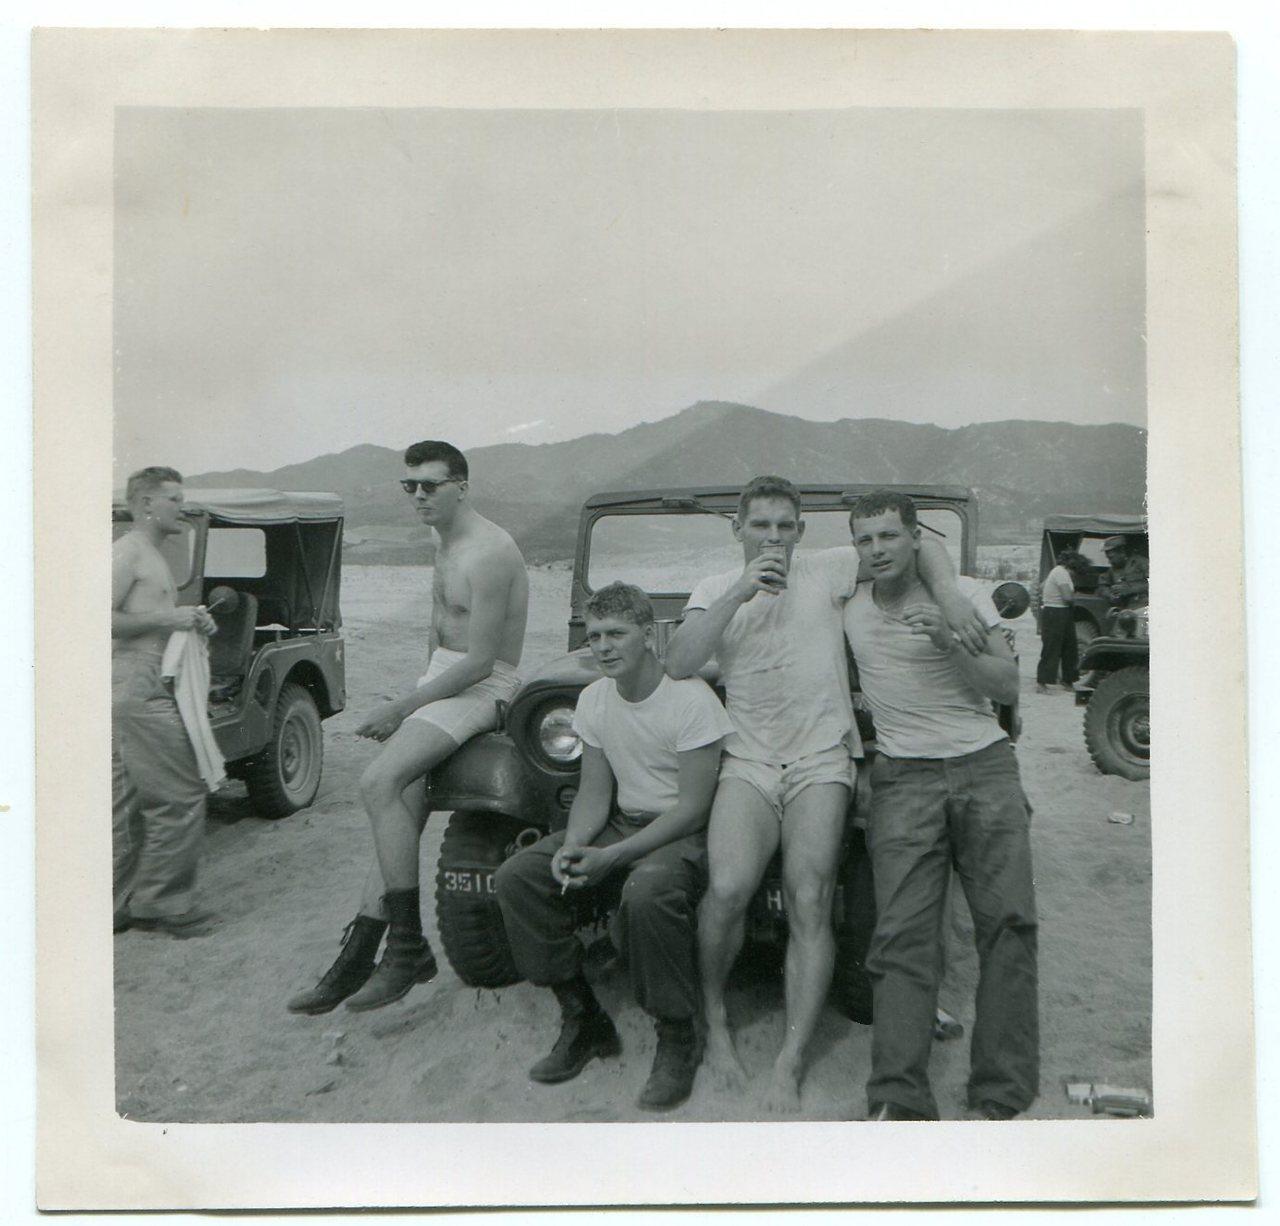 Vintage Naked Military Men